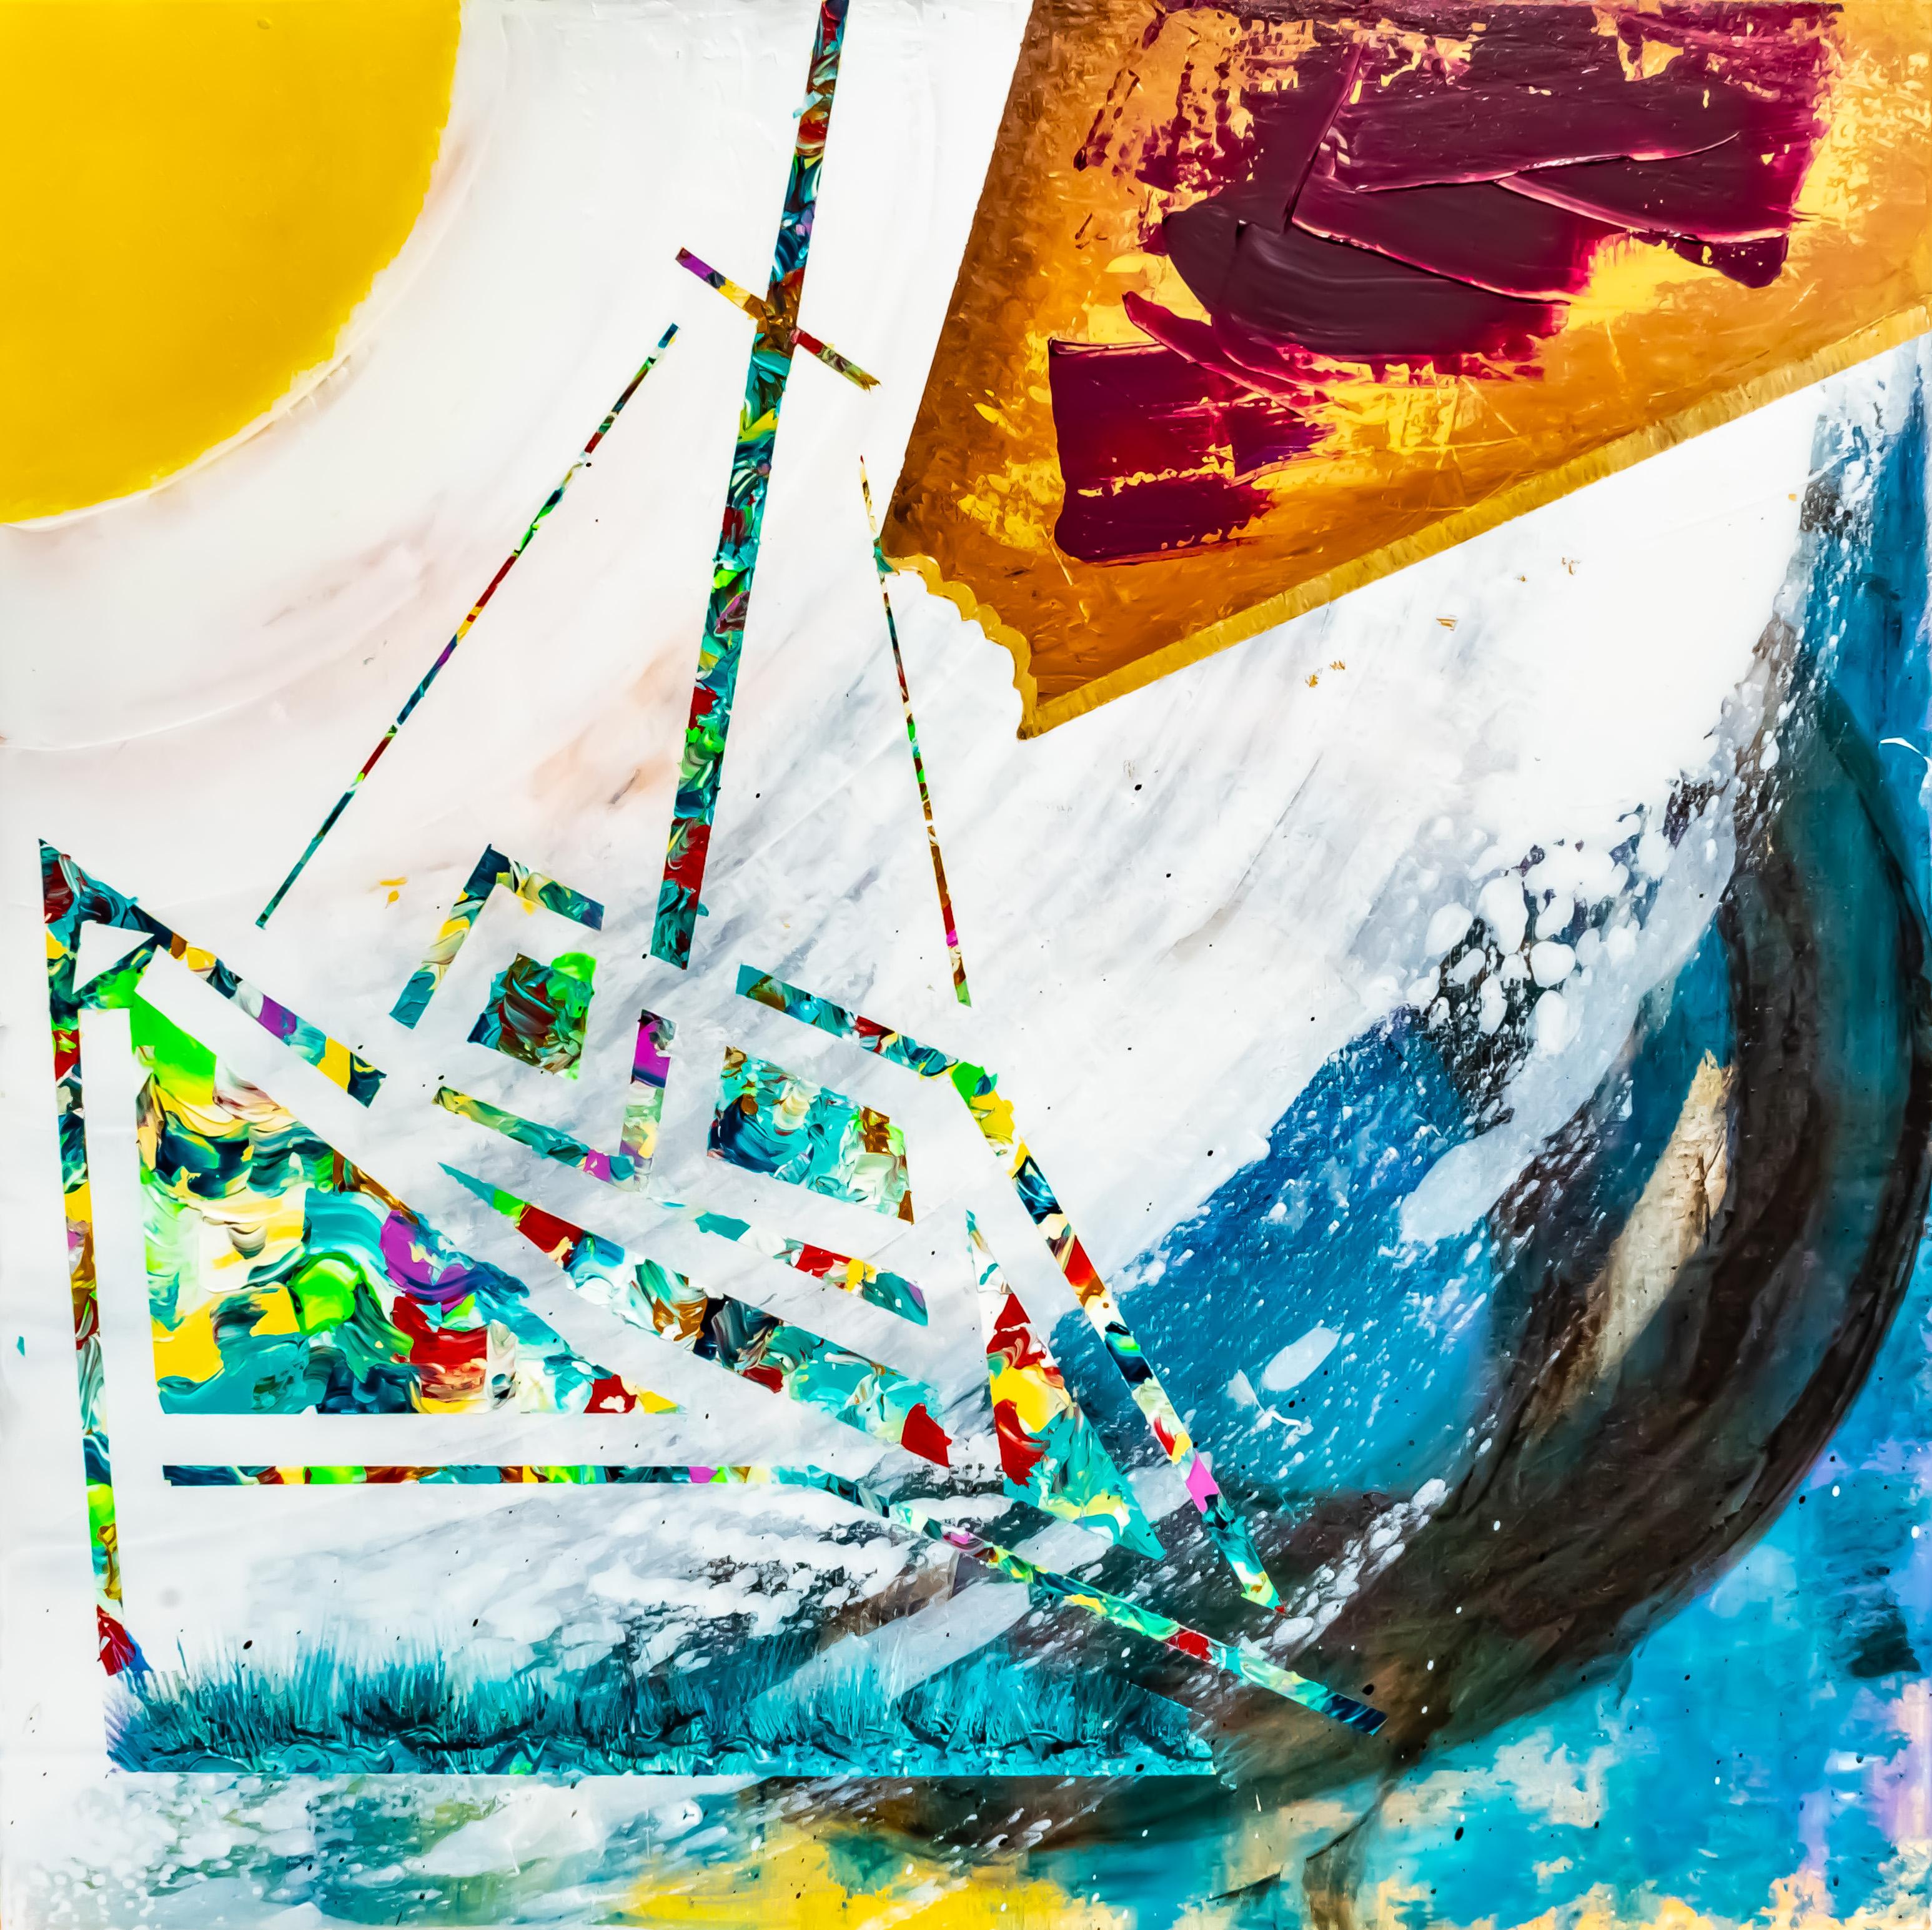 Art & Life with Steph DaLeigh - VoyagePhoenix - Phoenix